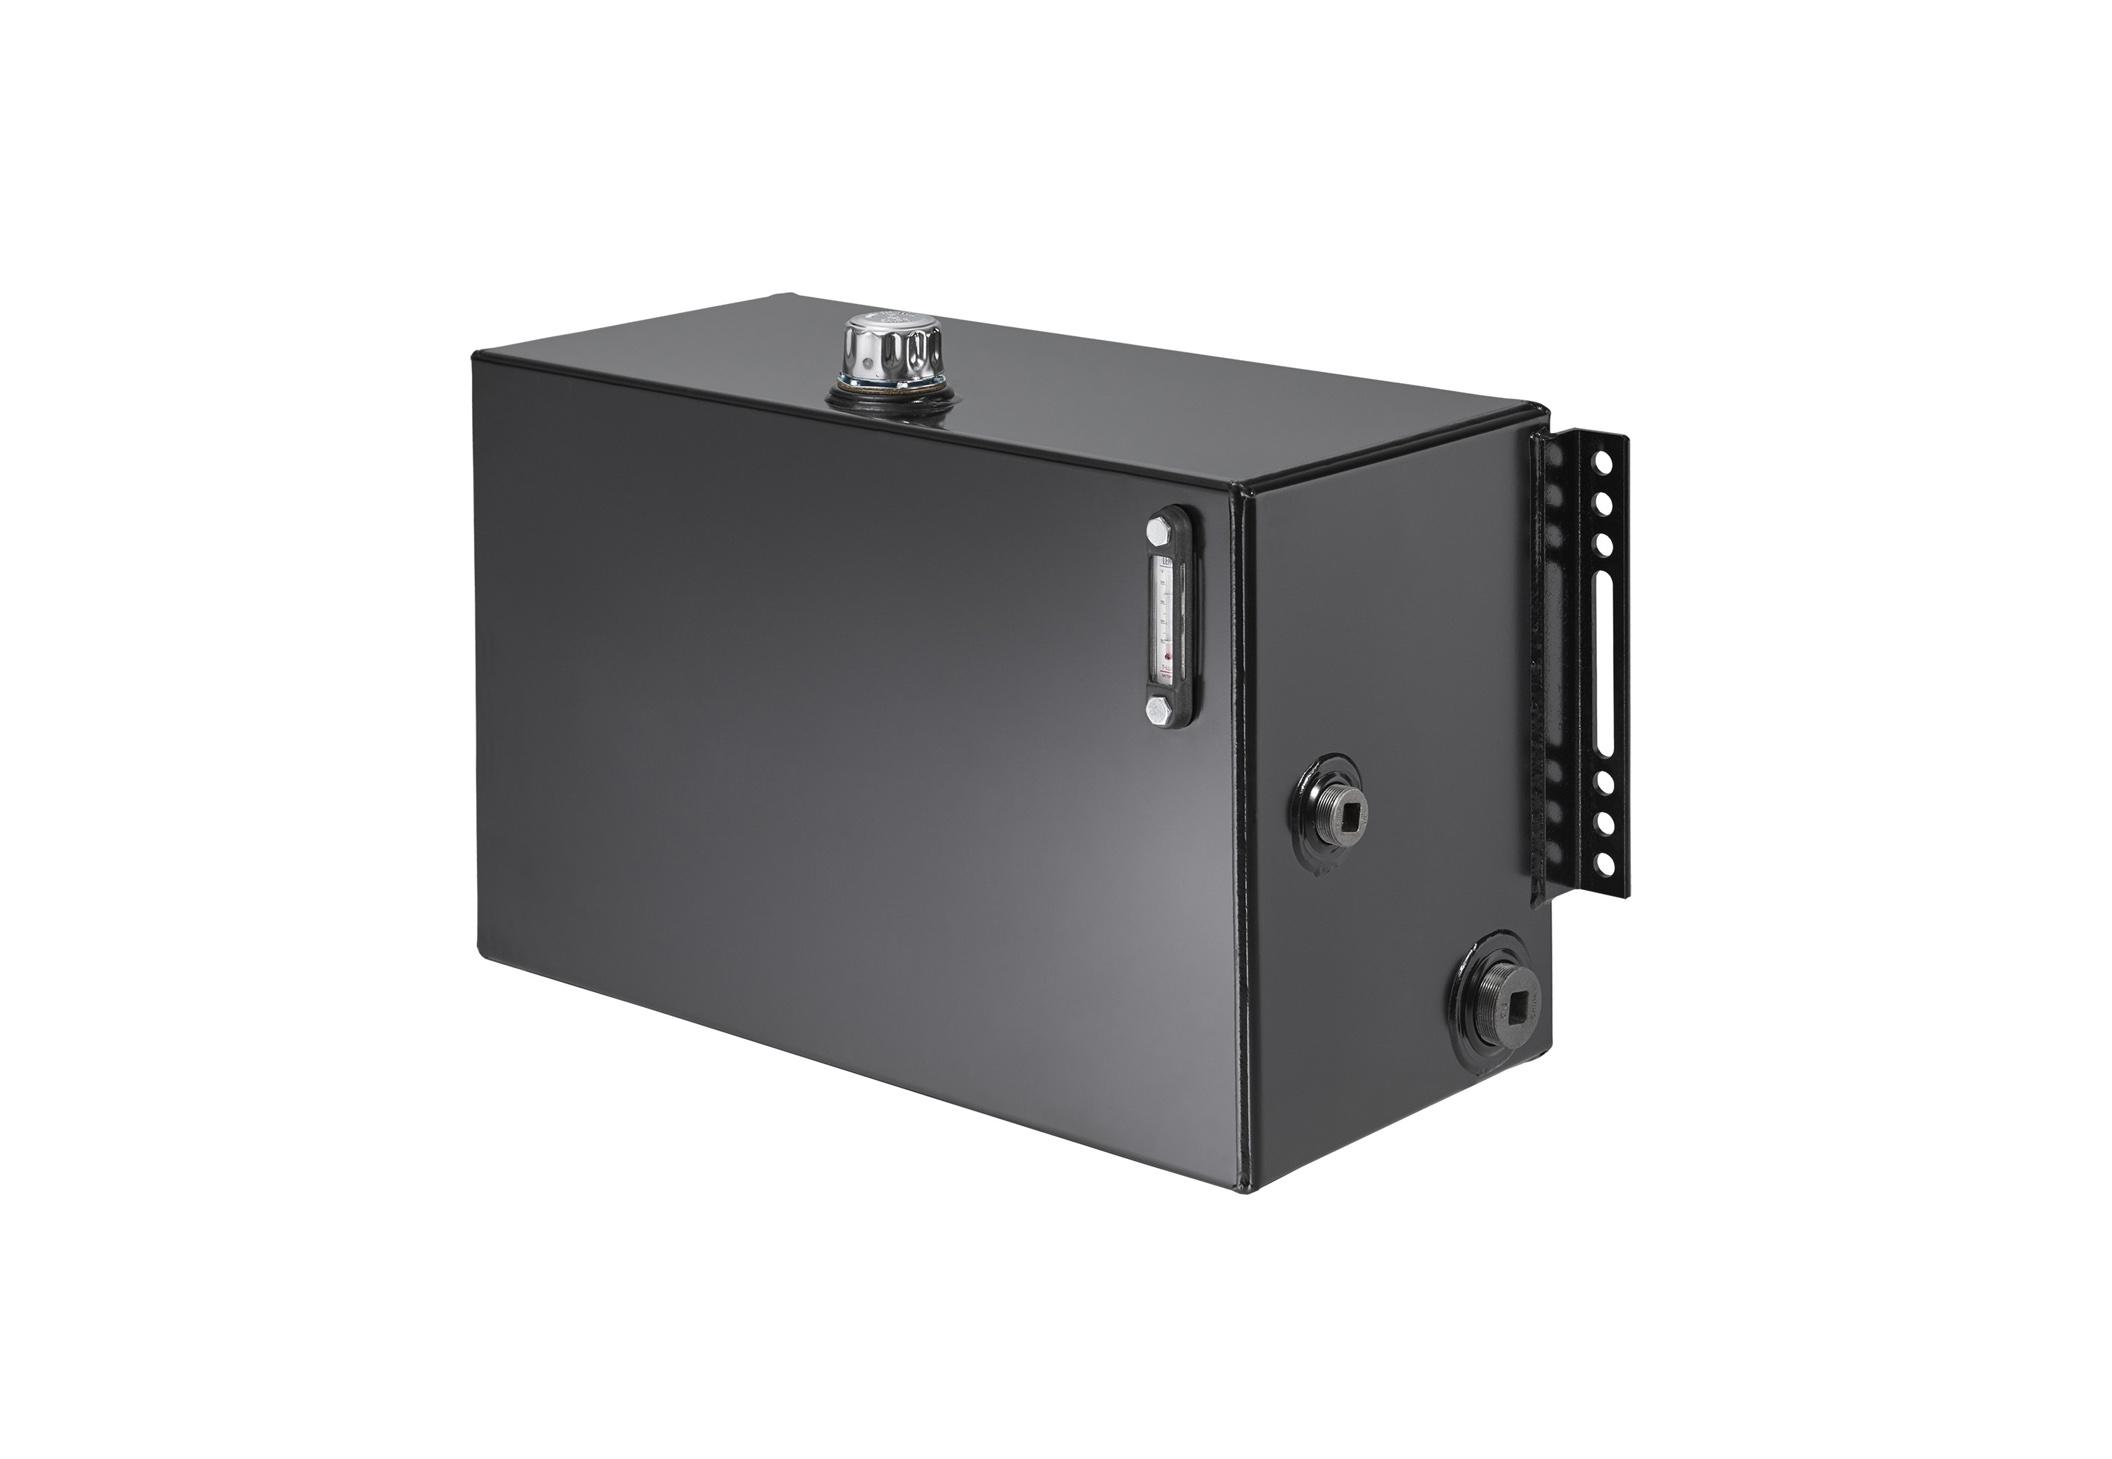 American Mobile Power | Steel Sidemount - 40 Gallon